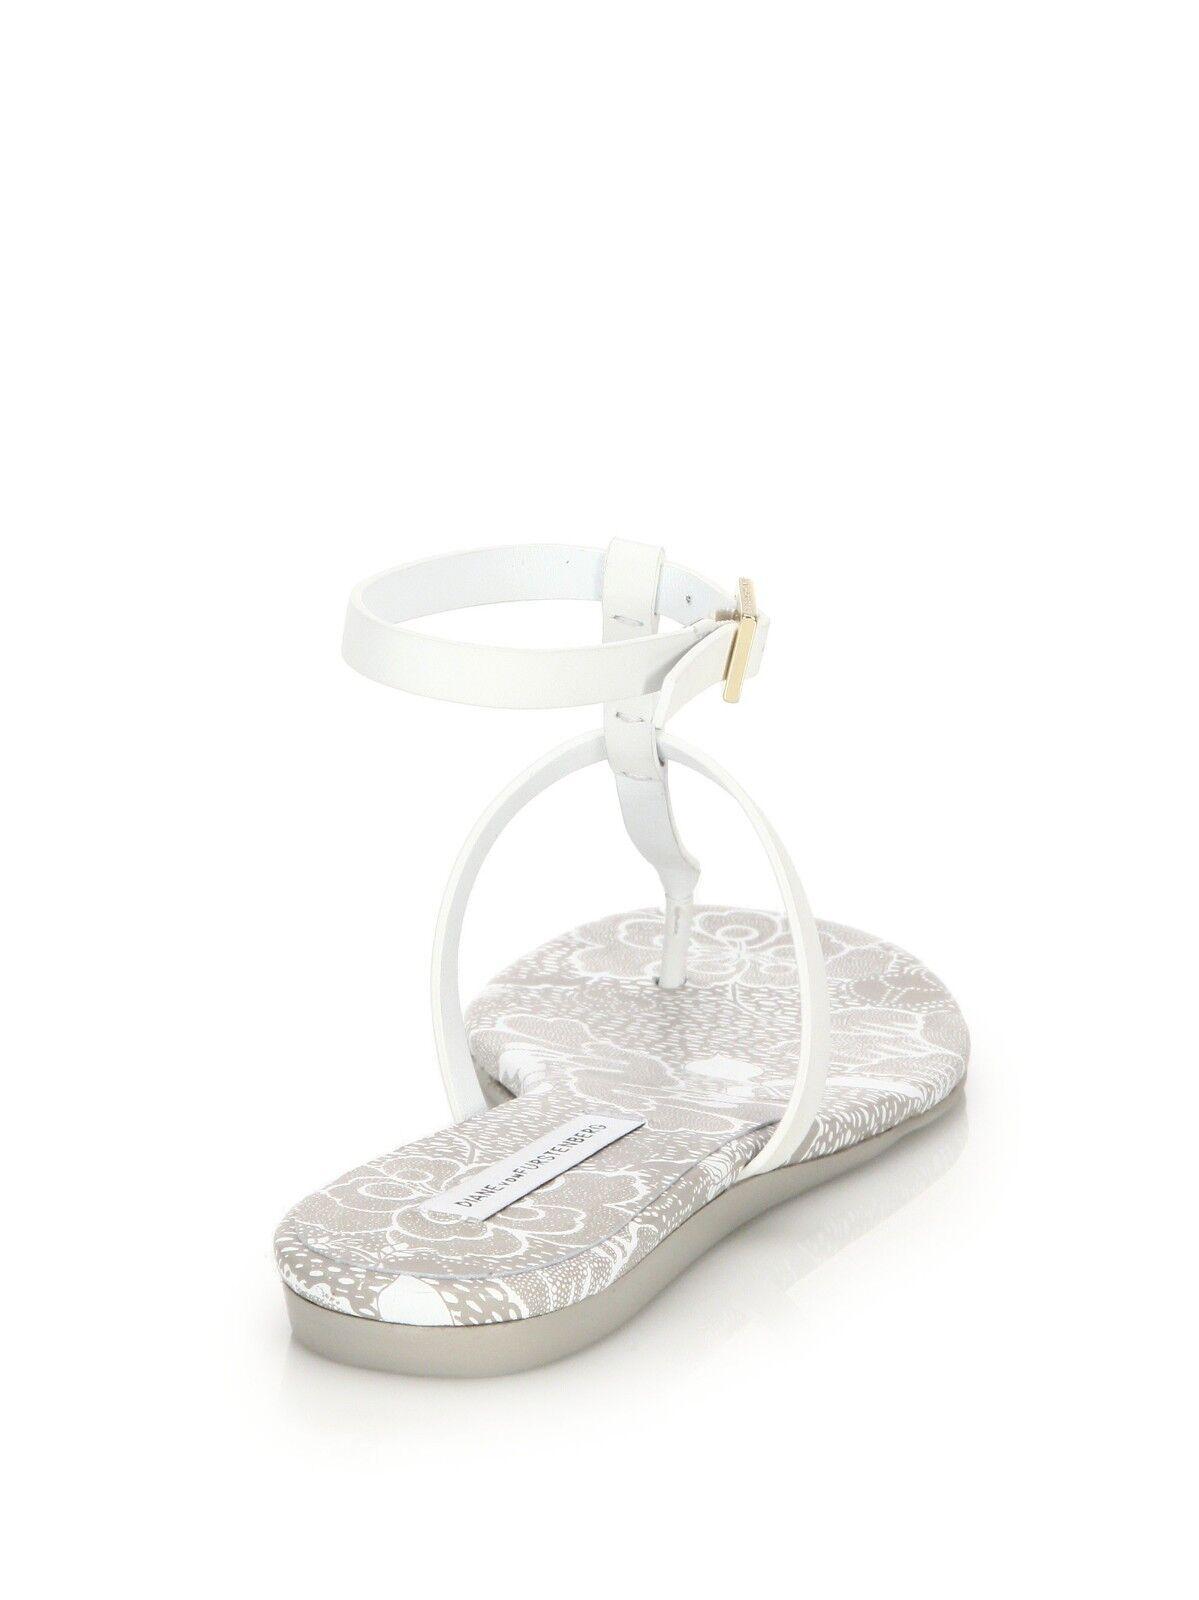 NEW DVF DIANE Schuhe FURSTENBERG PERUGIA T-STRAP SANDALS WEISS LEATHER Schuhe DIANE 10 40 9388a8